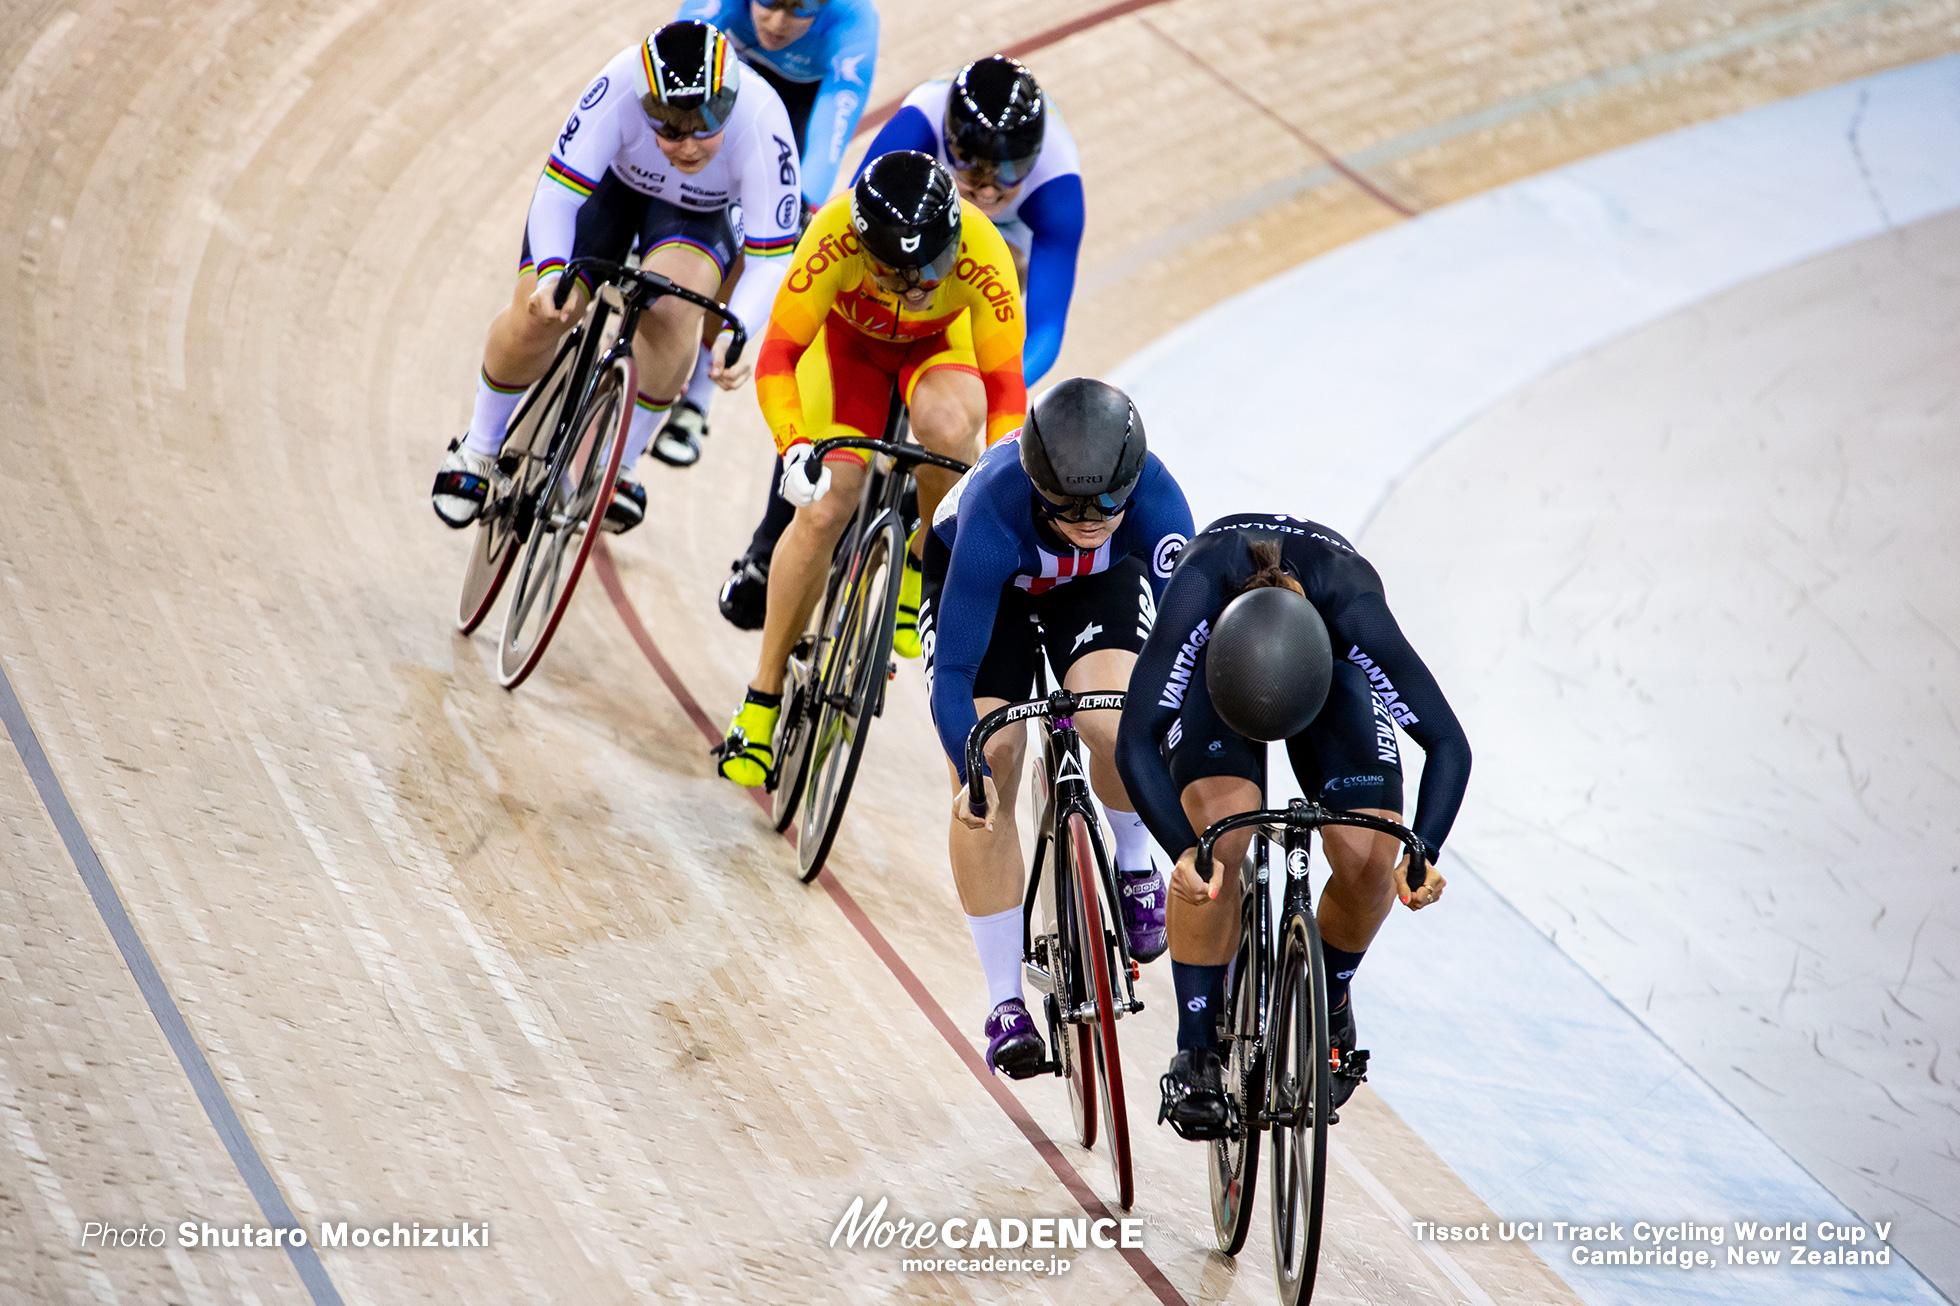 Final / Women's Keirin / Track Cycling World Cup V / Cambridge, New Zealand